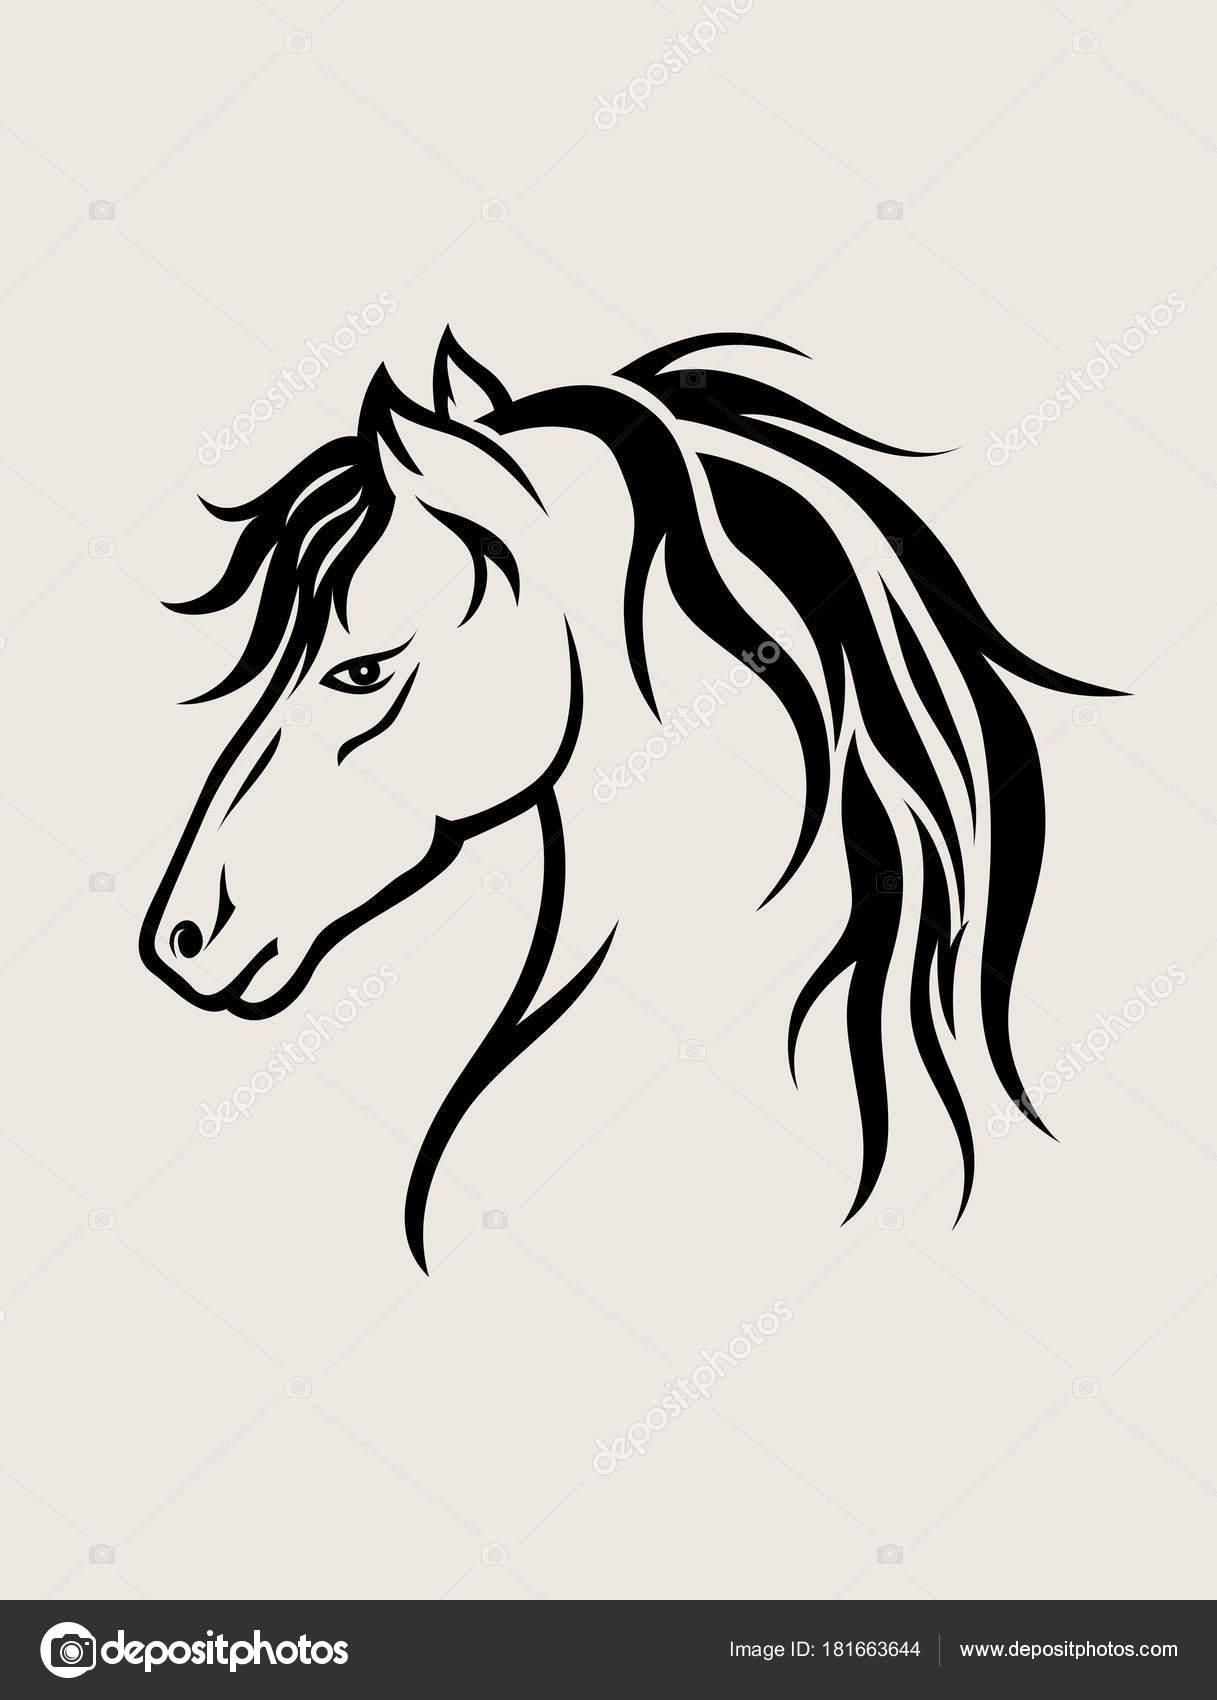 Horse Face Art Horse Face Art Vector Design Stock Vector C Sumbajimartinus 181663644